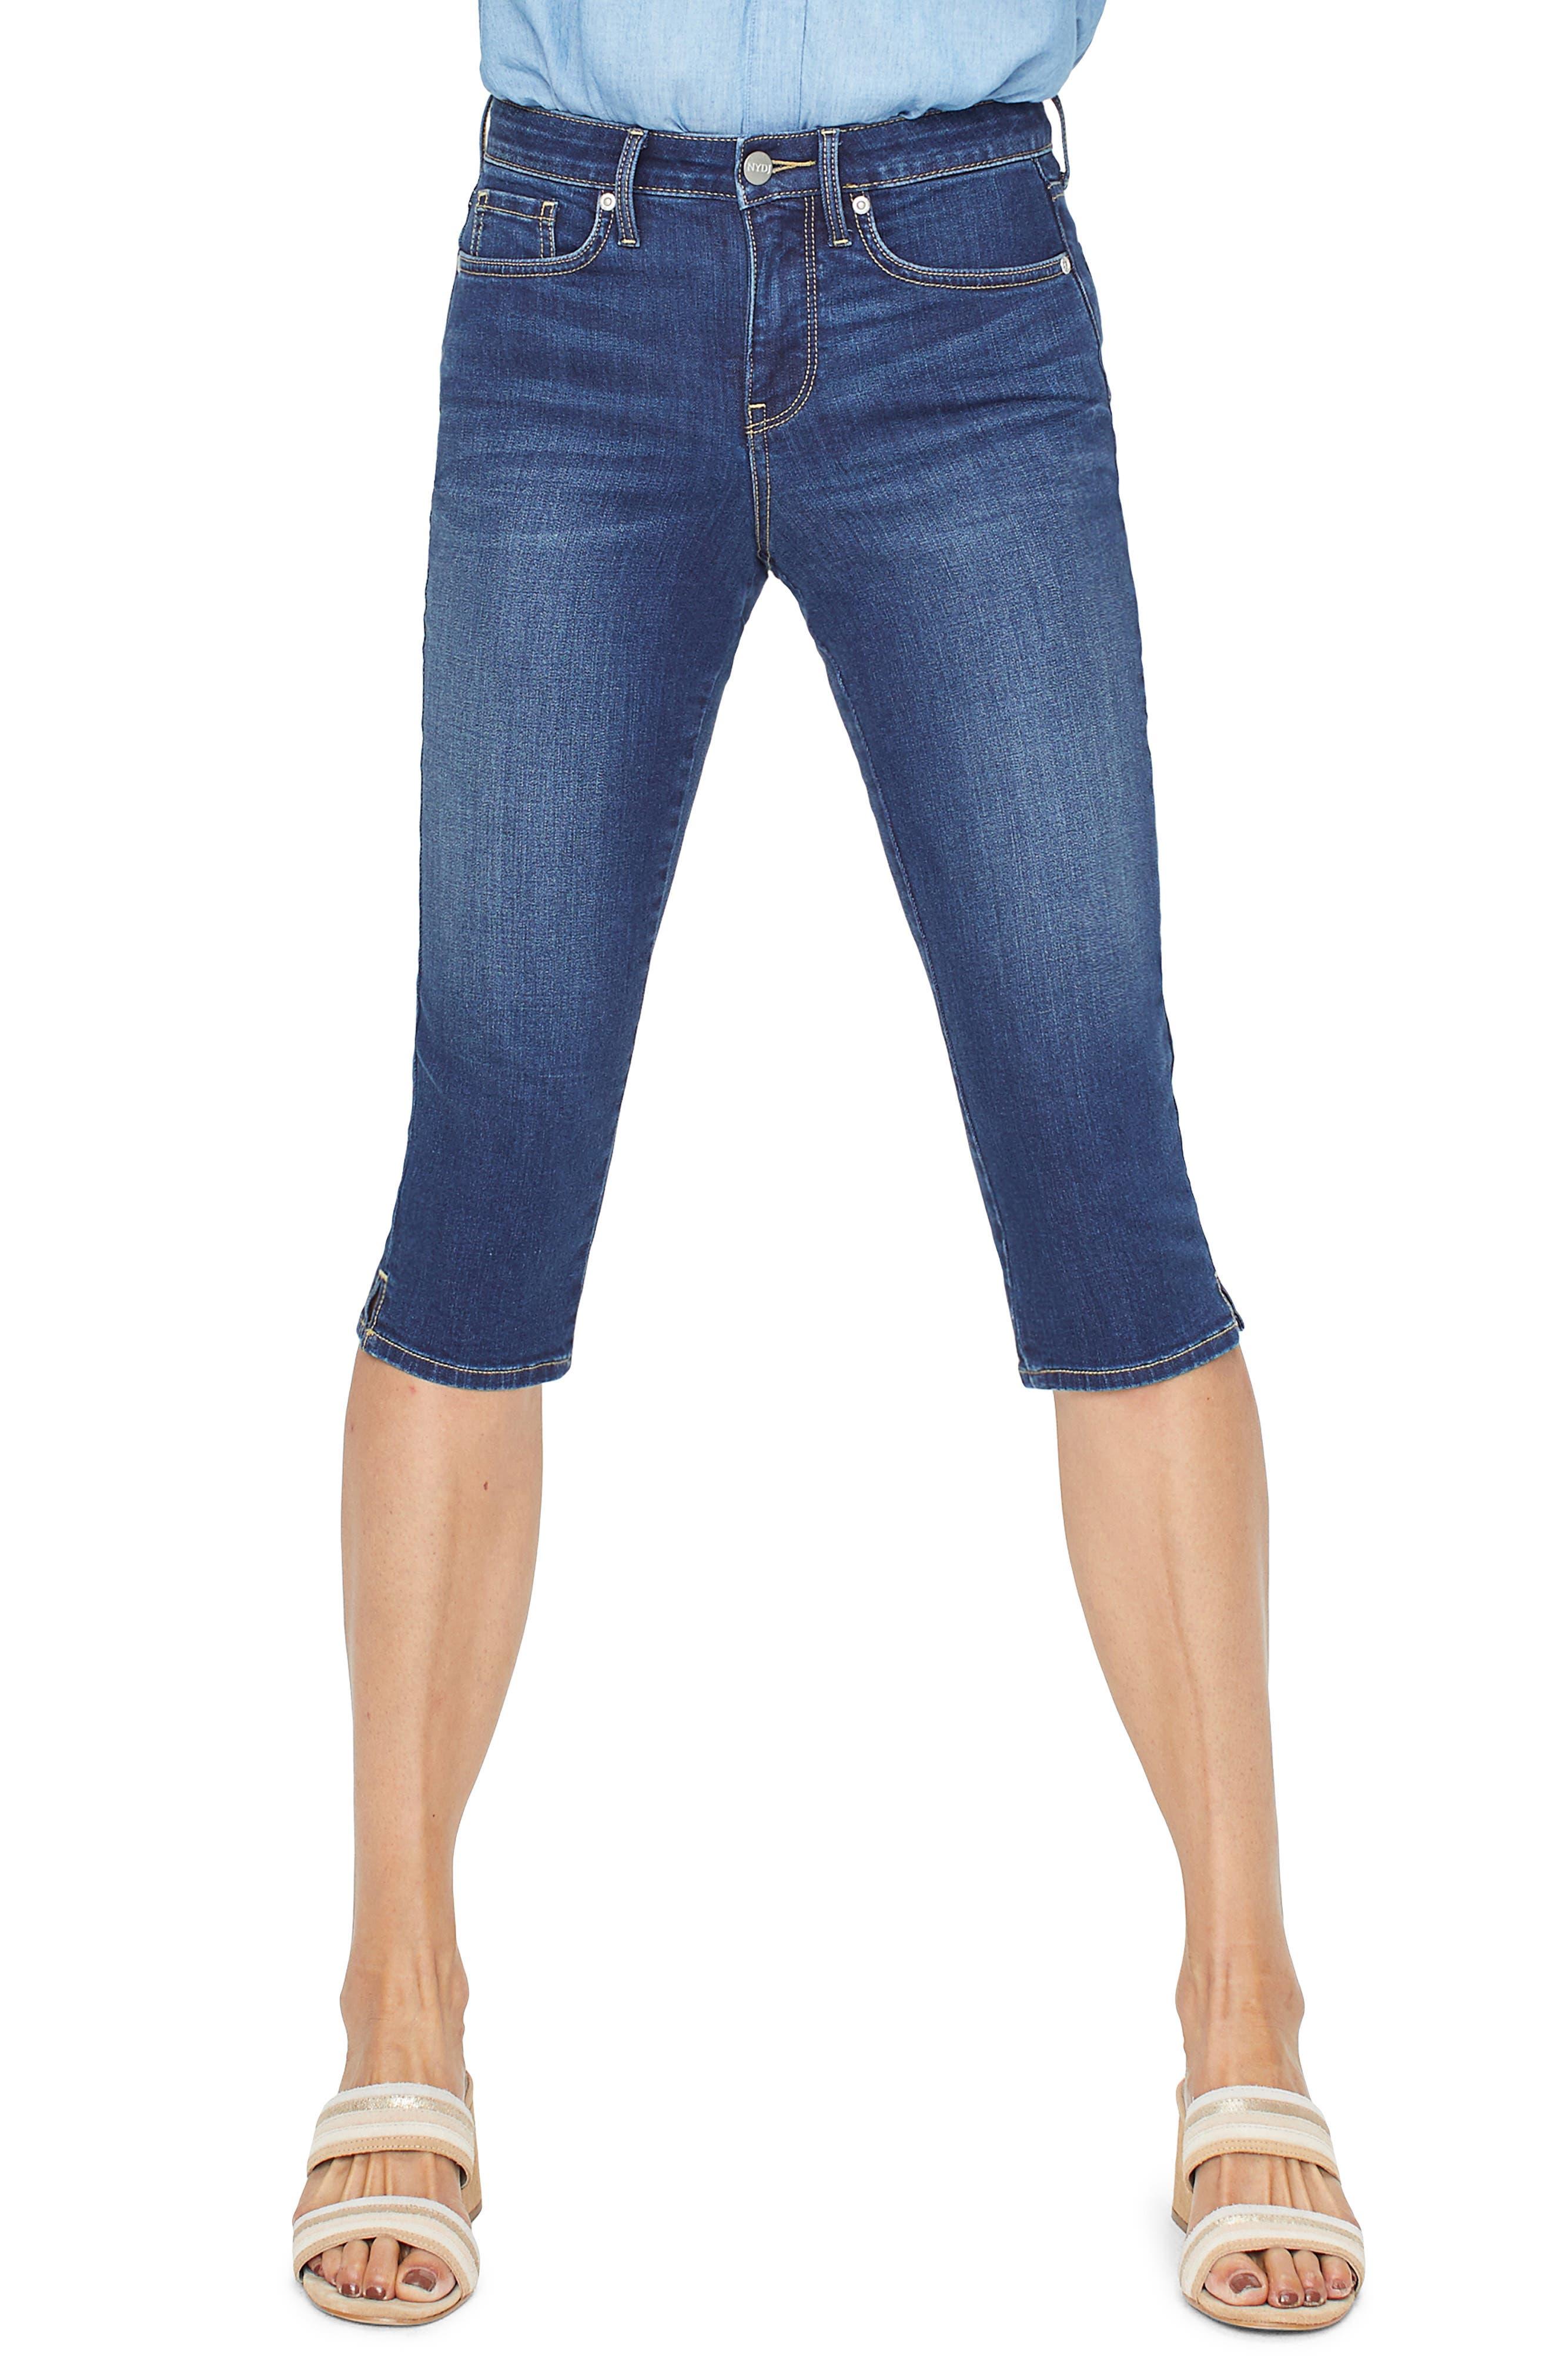 Nydj Skinny Capri Jeans, Blue